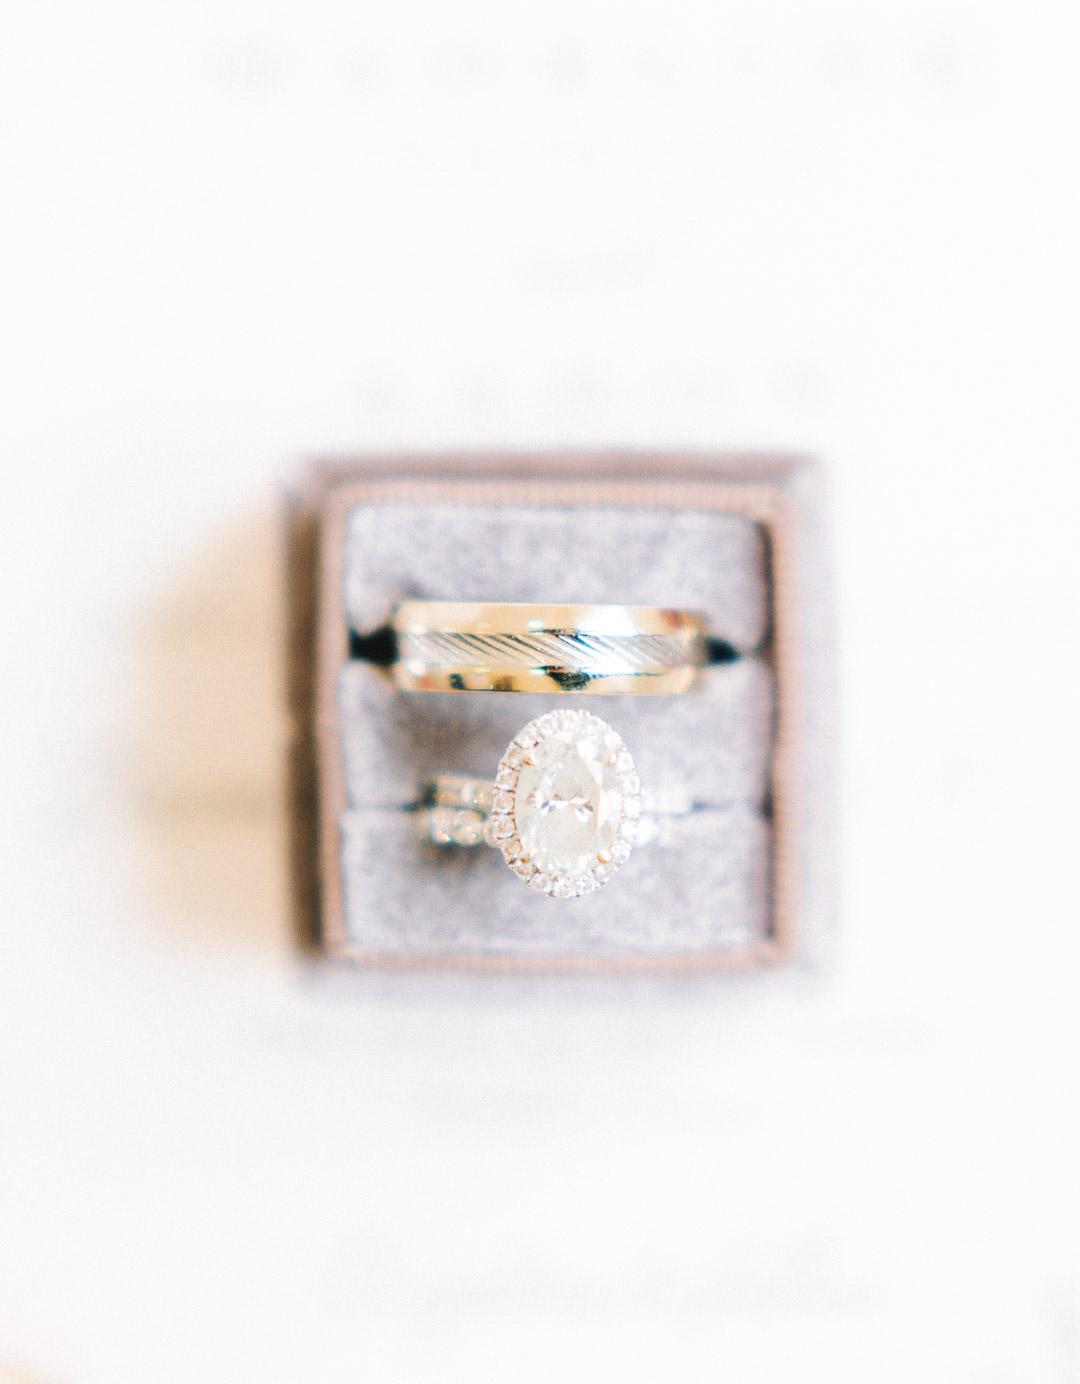 Wedding Photographer Dallas-Fort Worth Heirloom Rose Photography Image Copyright Heirloom Rose Photography